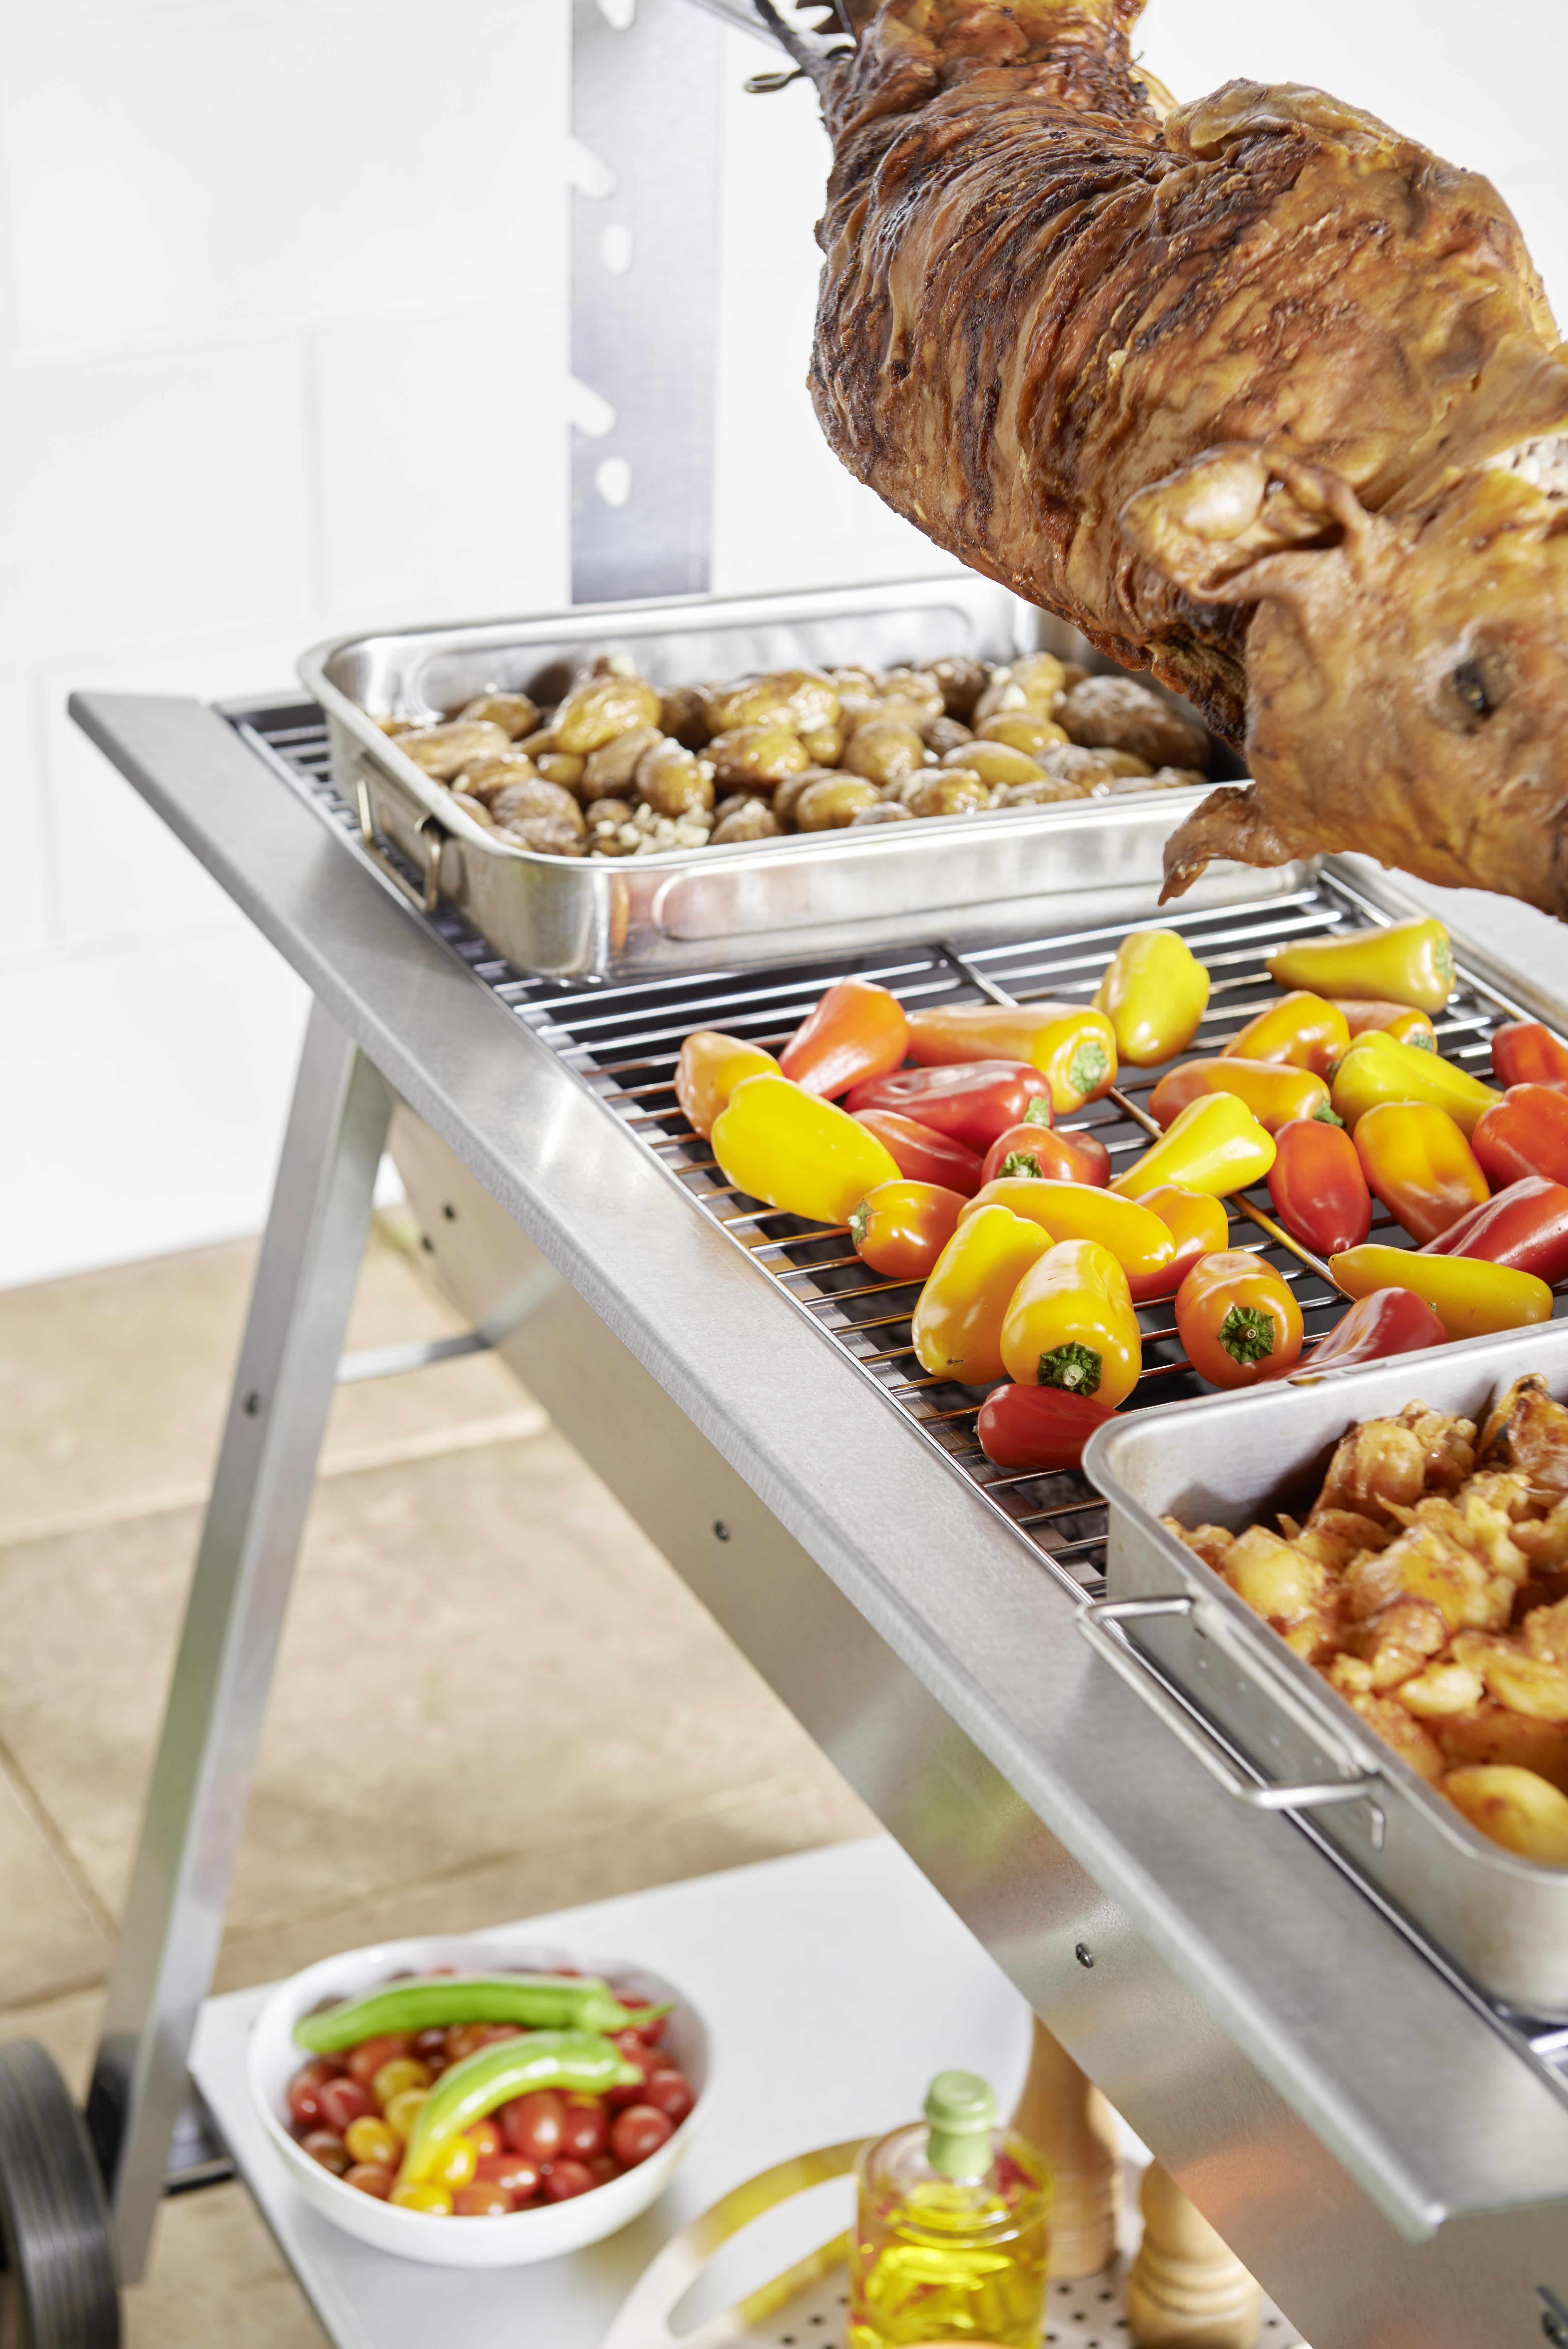 Barbecue BURGOS.